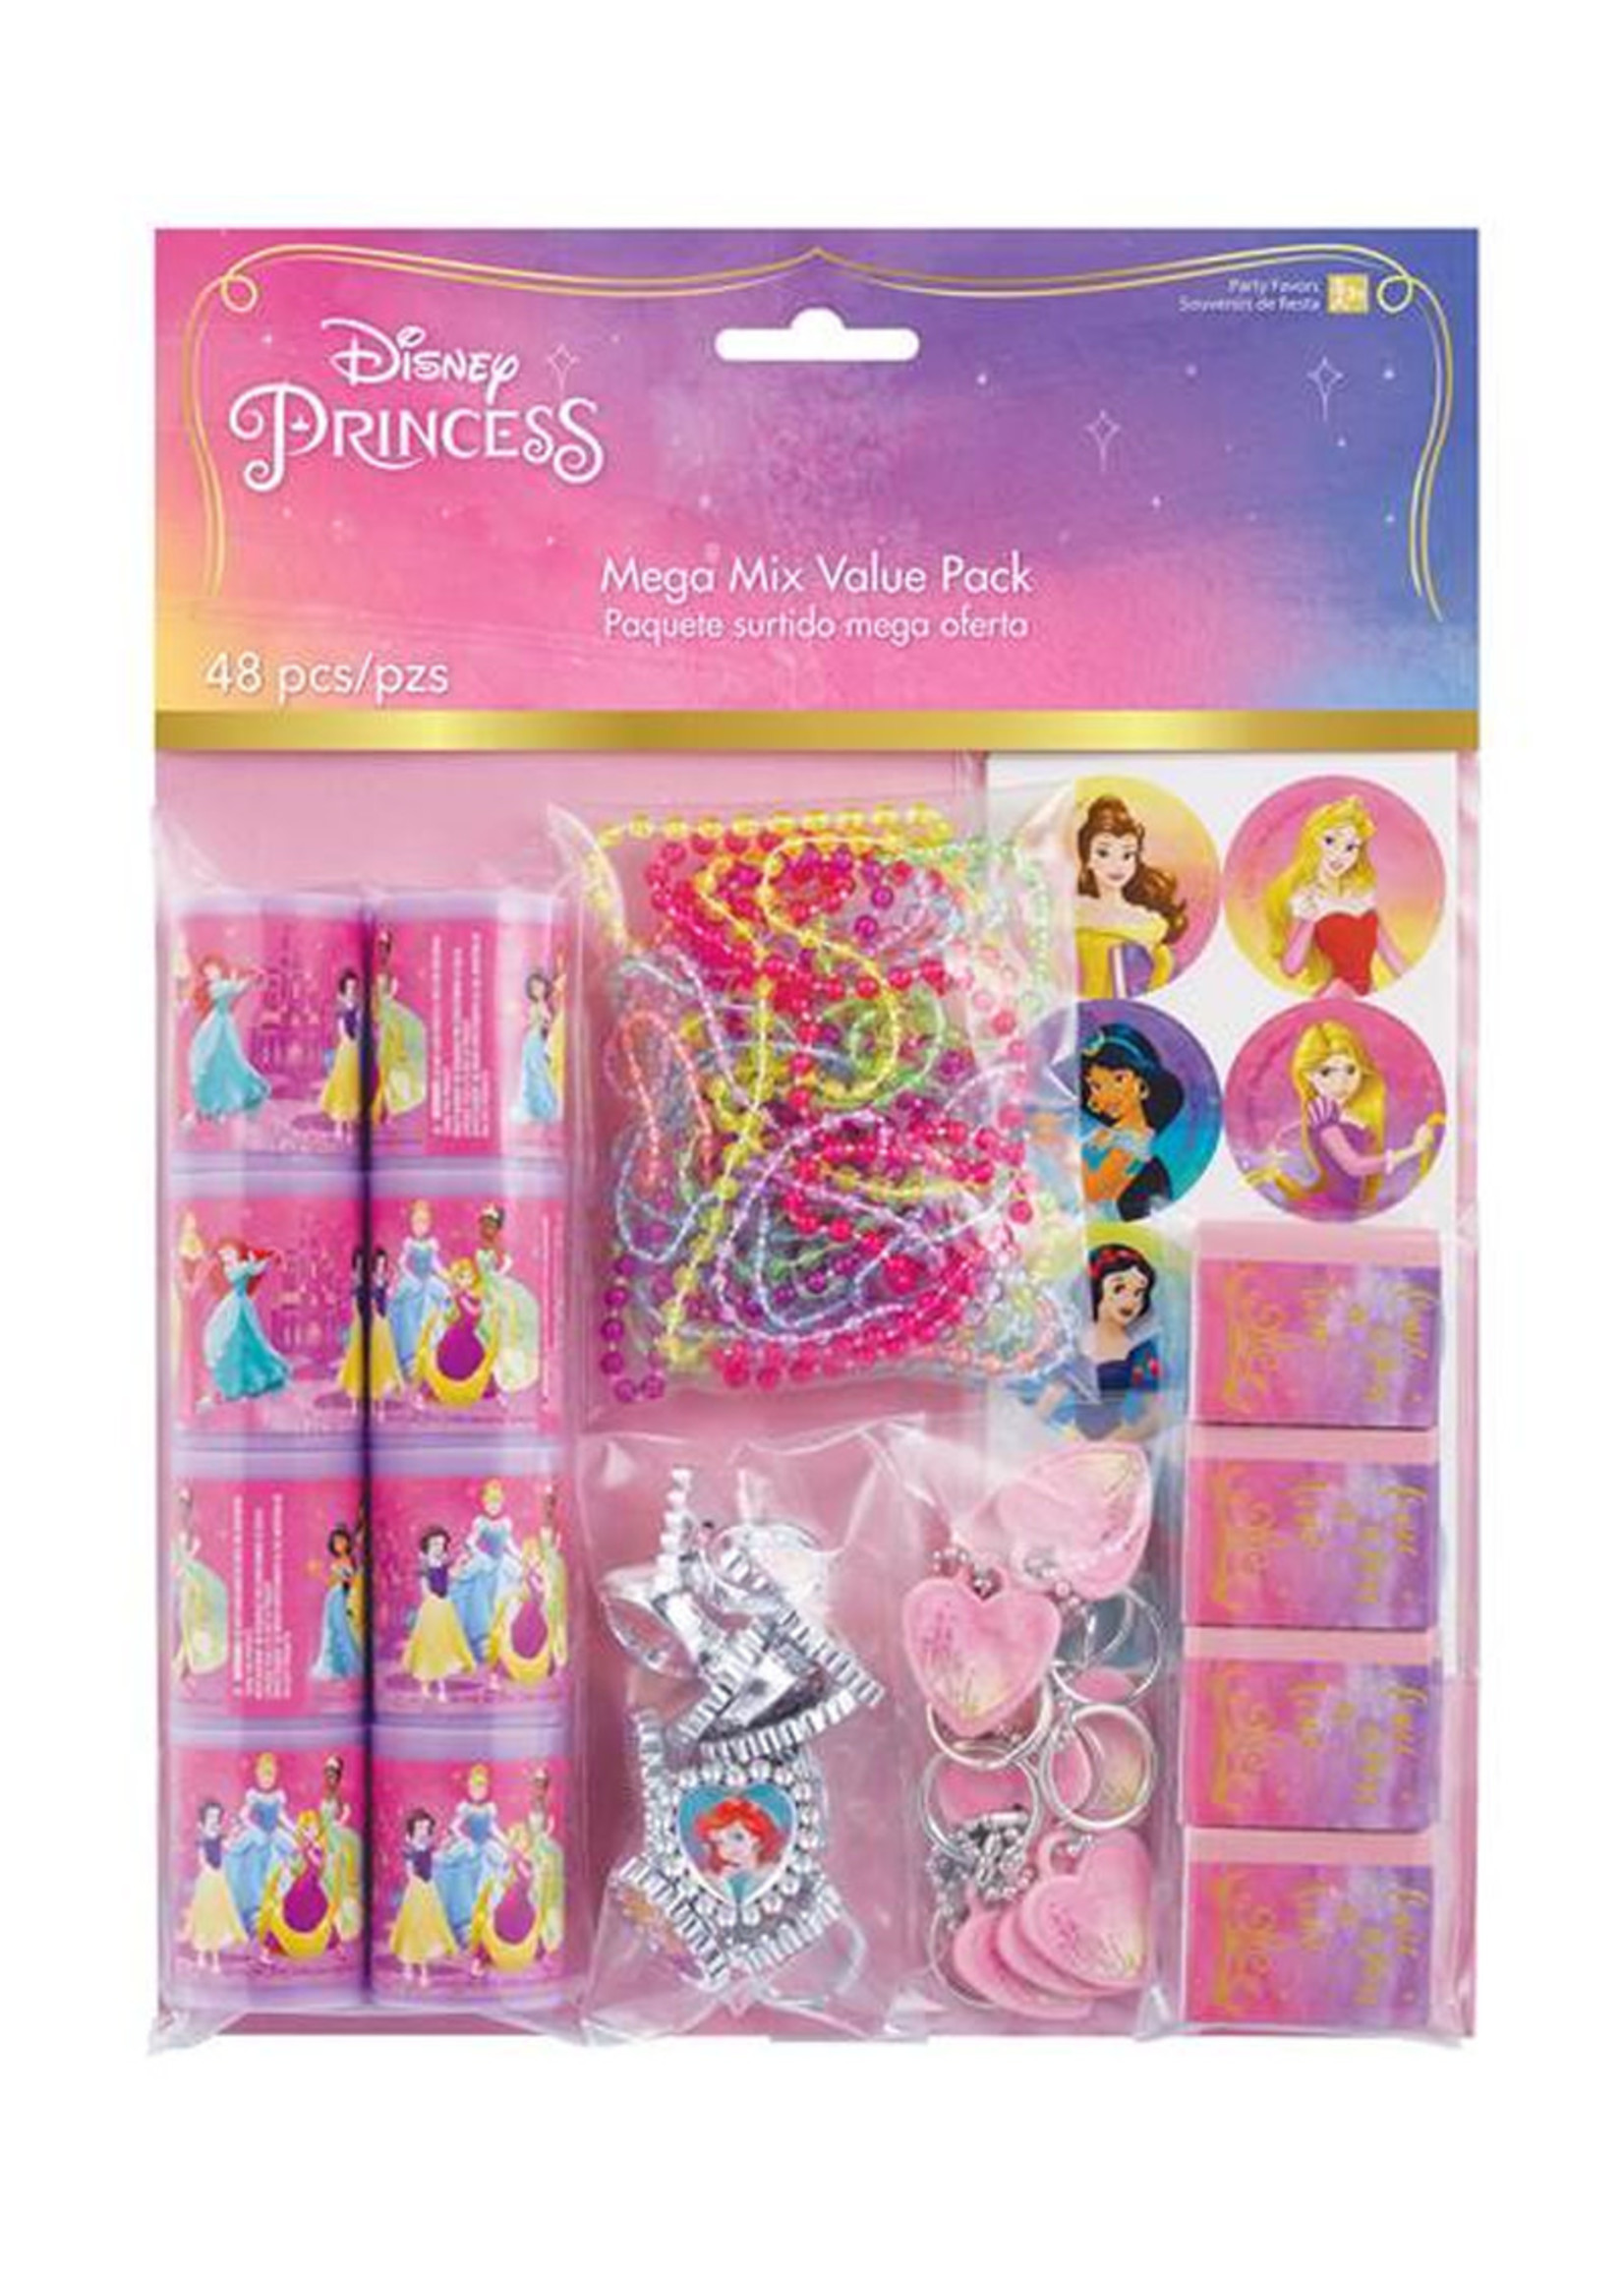 Disney Princess Once Upon A Time Mega Mix Favor Pack